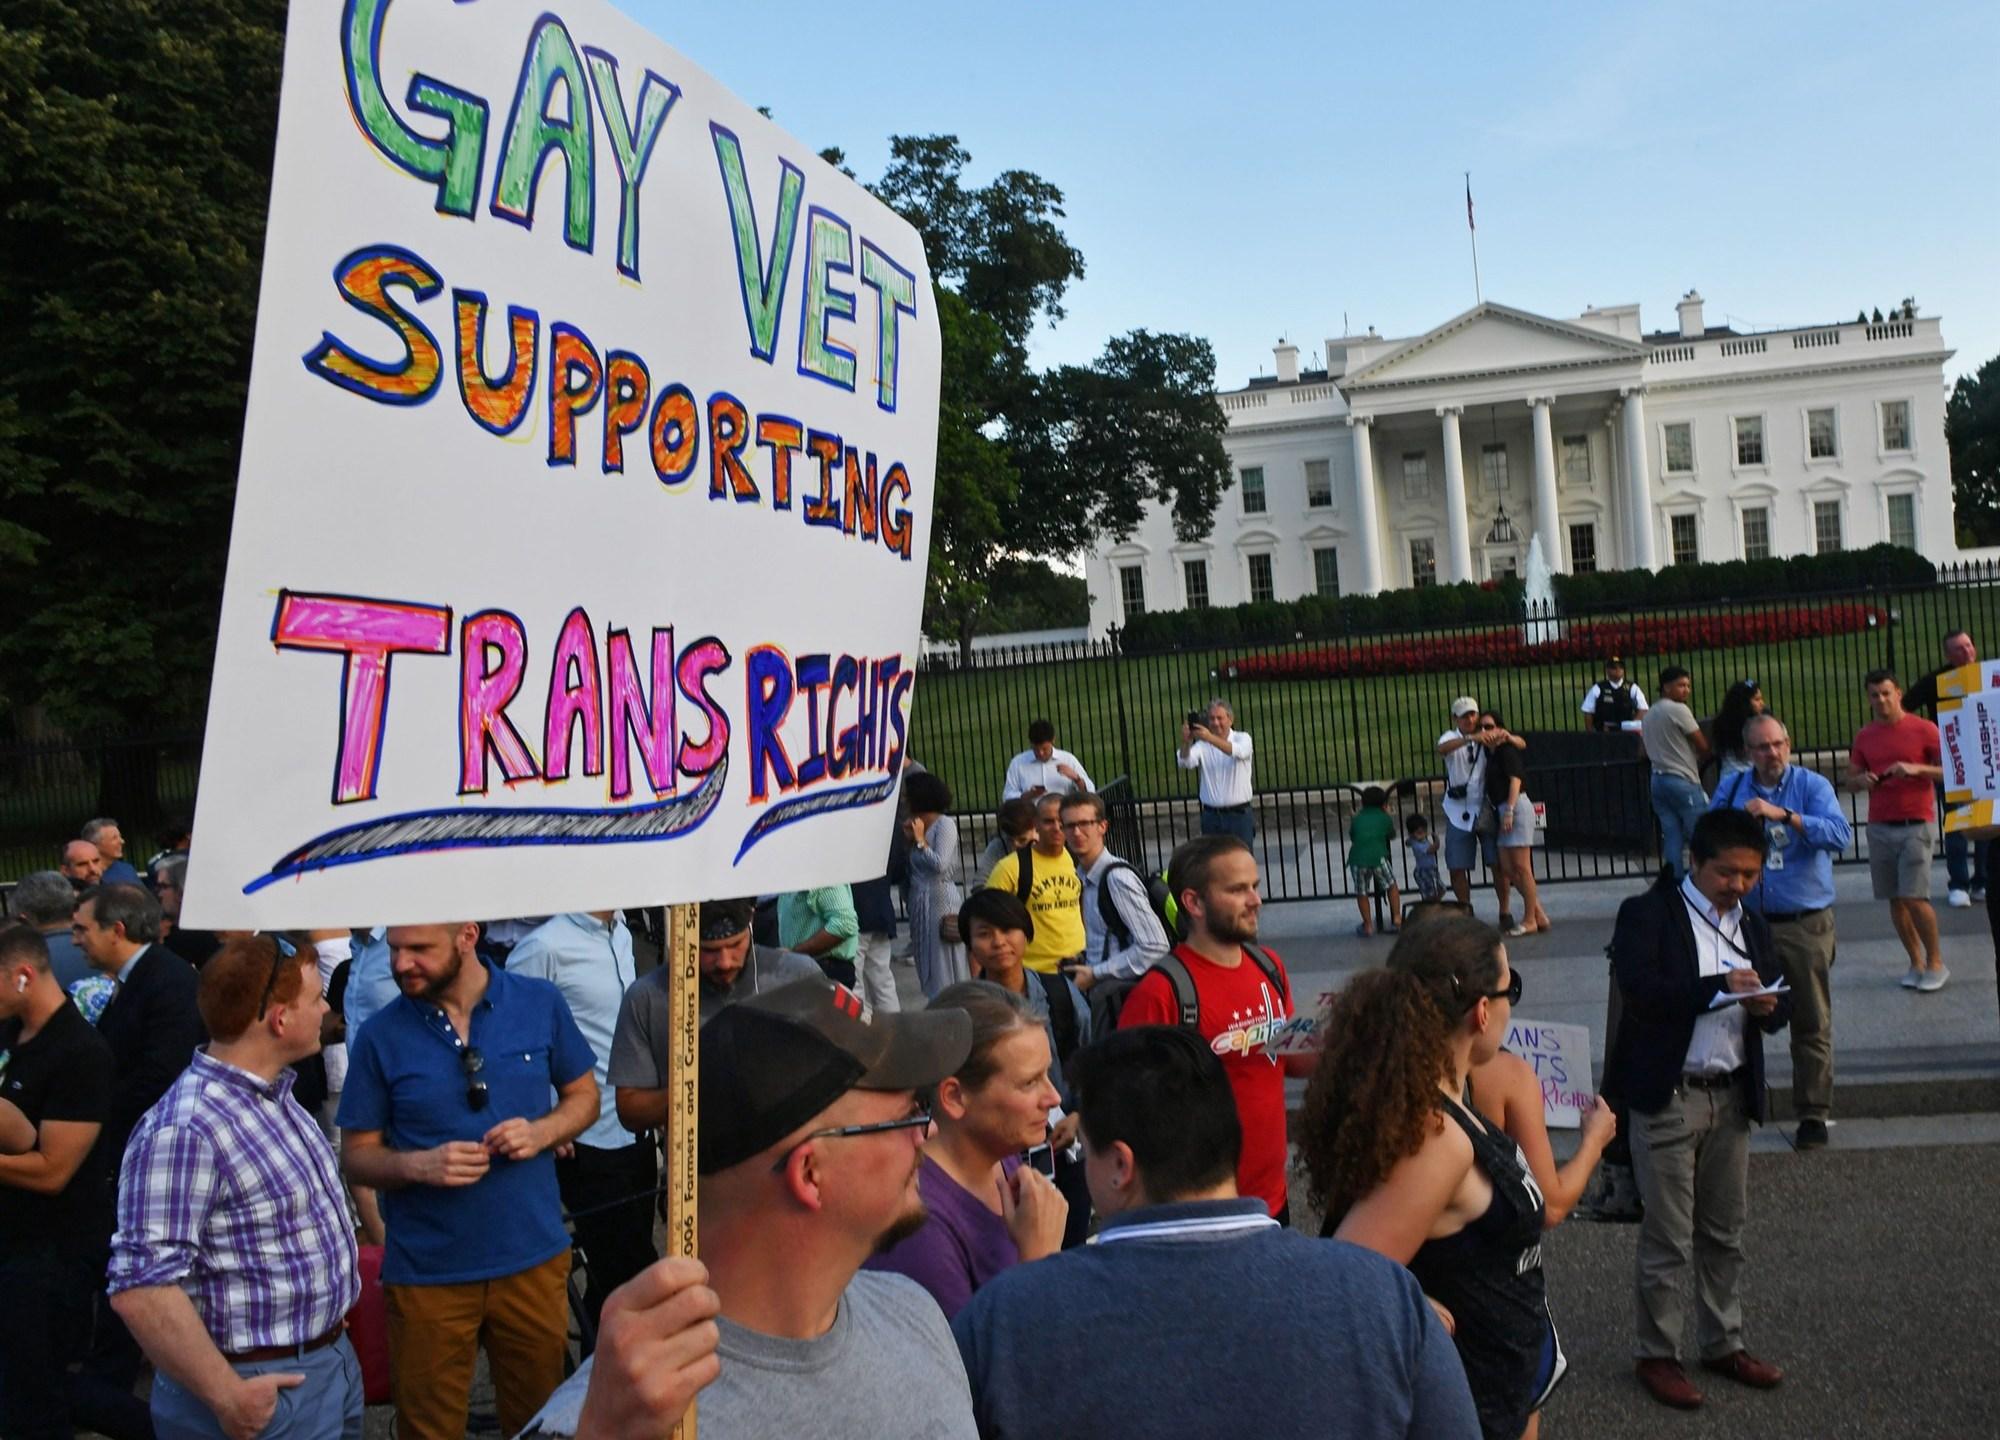 190122-transgender-military-ban-protest-cs-944a_798bd74f7561abad627108908e2ca261.fit-2000w_1548177317443.jpg